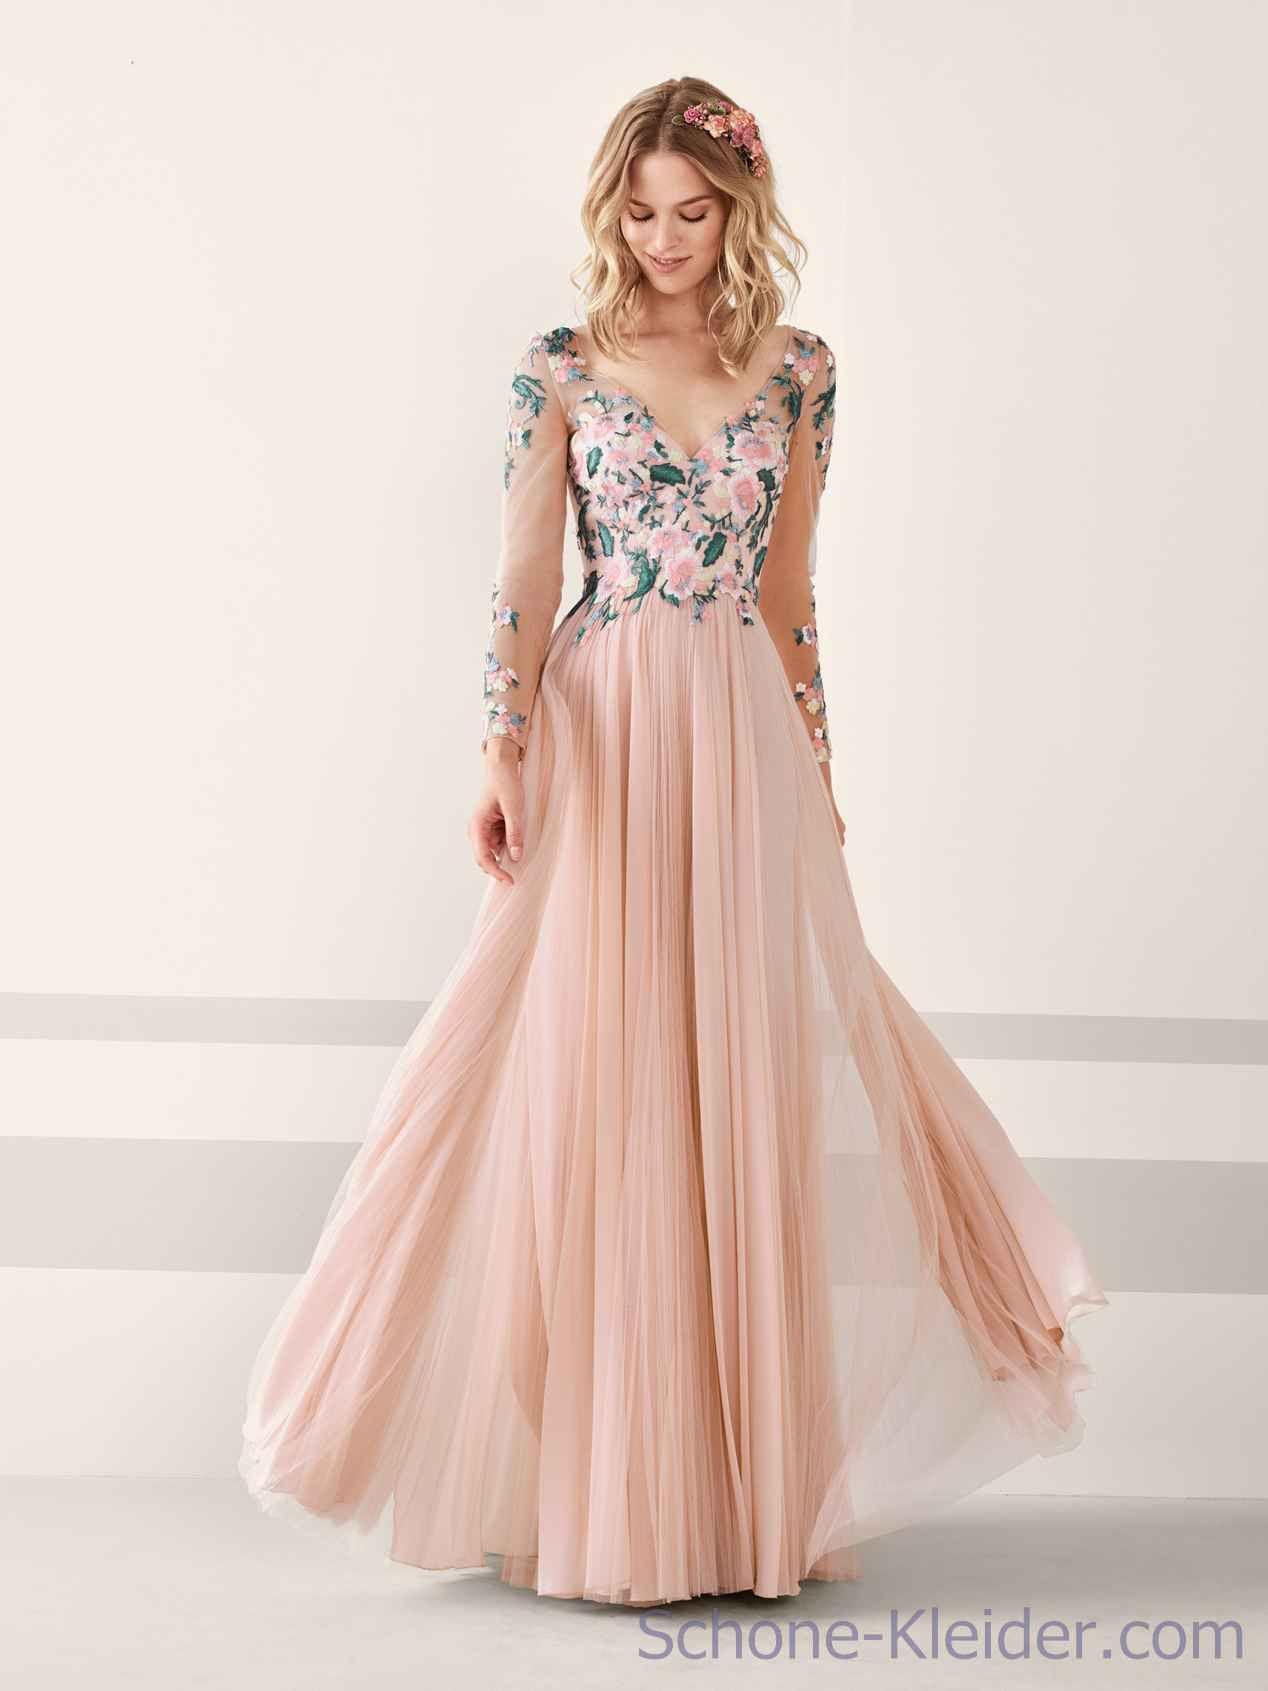 Pronovias abendkleider sale  Stilvolle Jugendkleidung